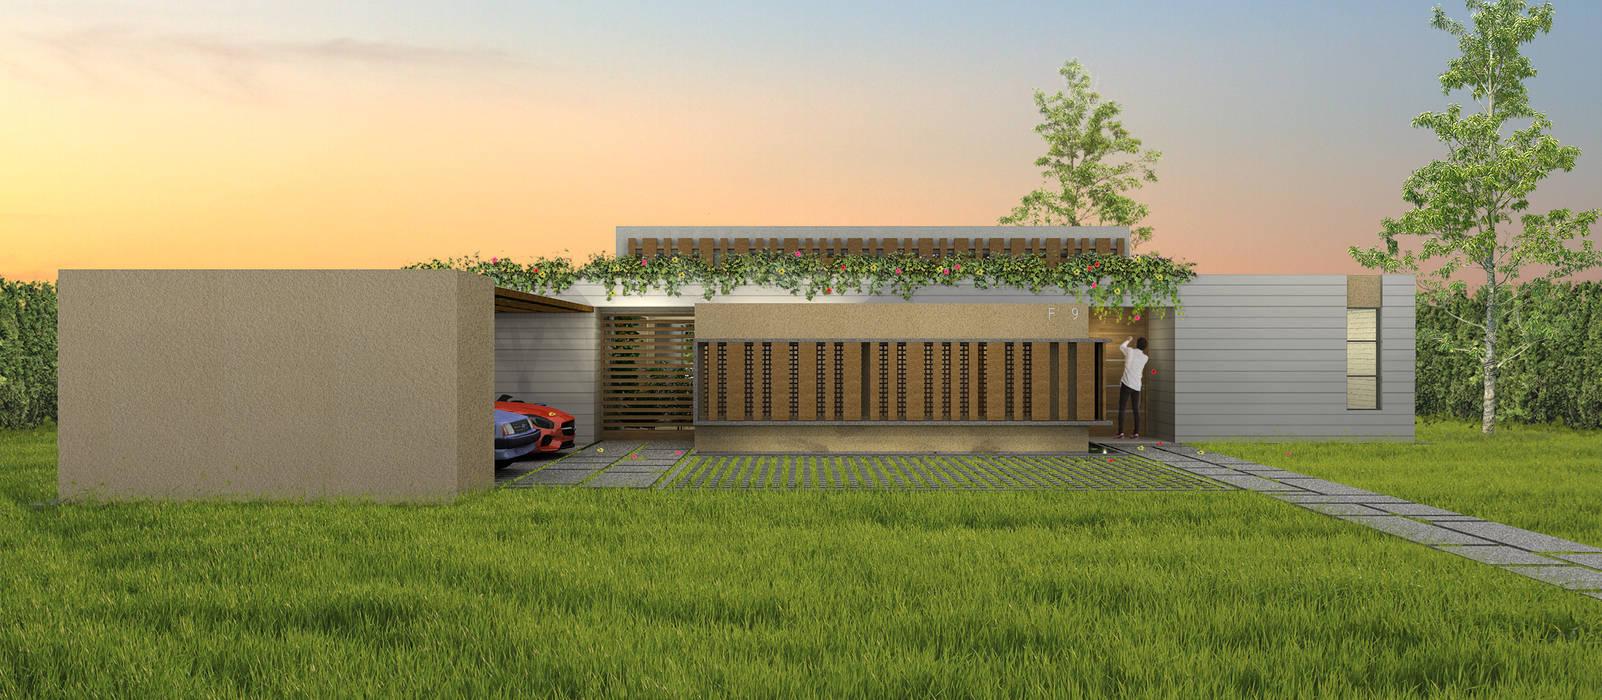 Casa La Morada DV: Casas de estilo  por COLECTIVO CREATIVO, Moderno